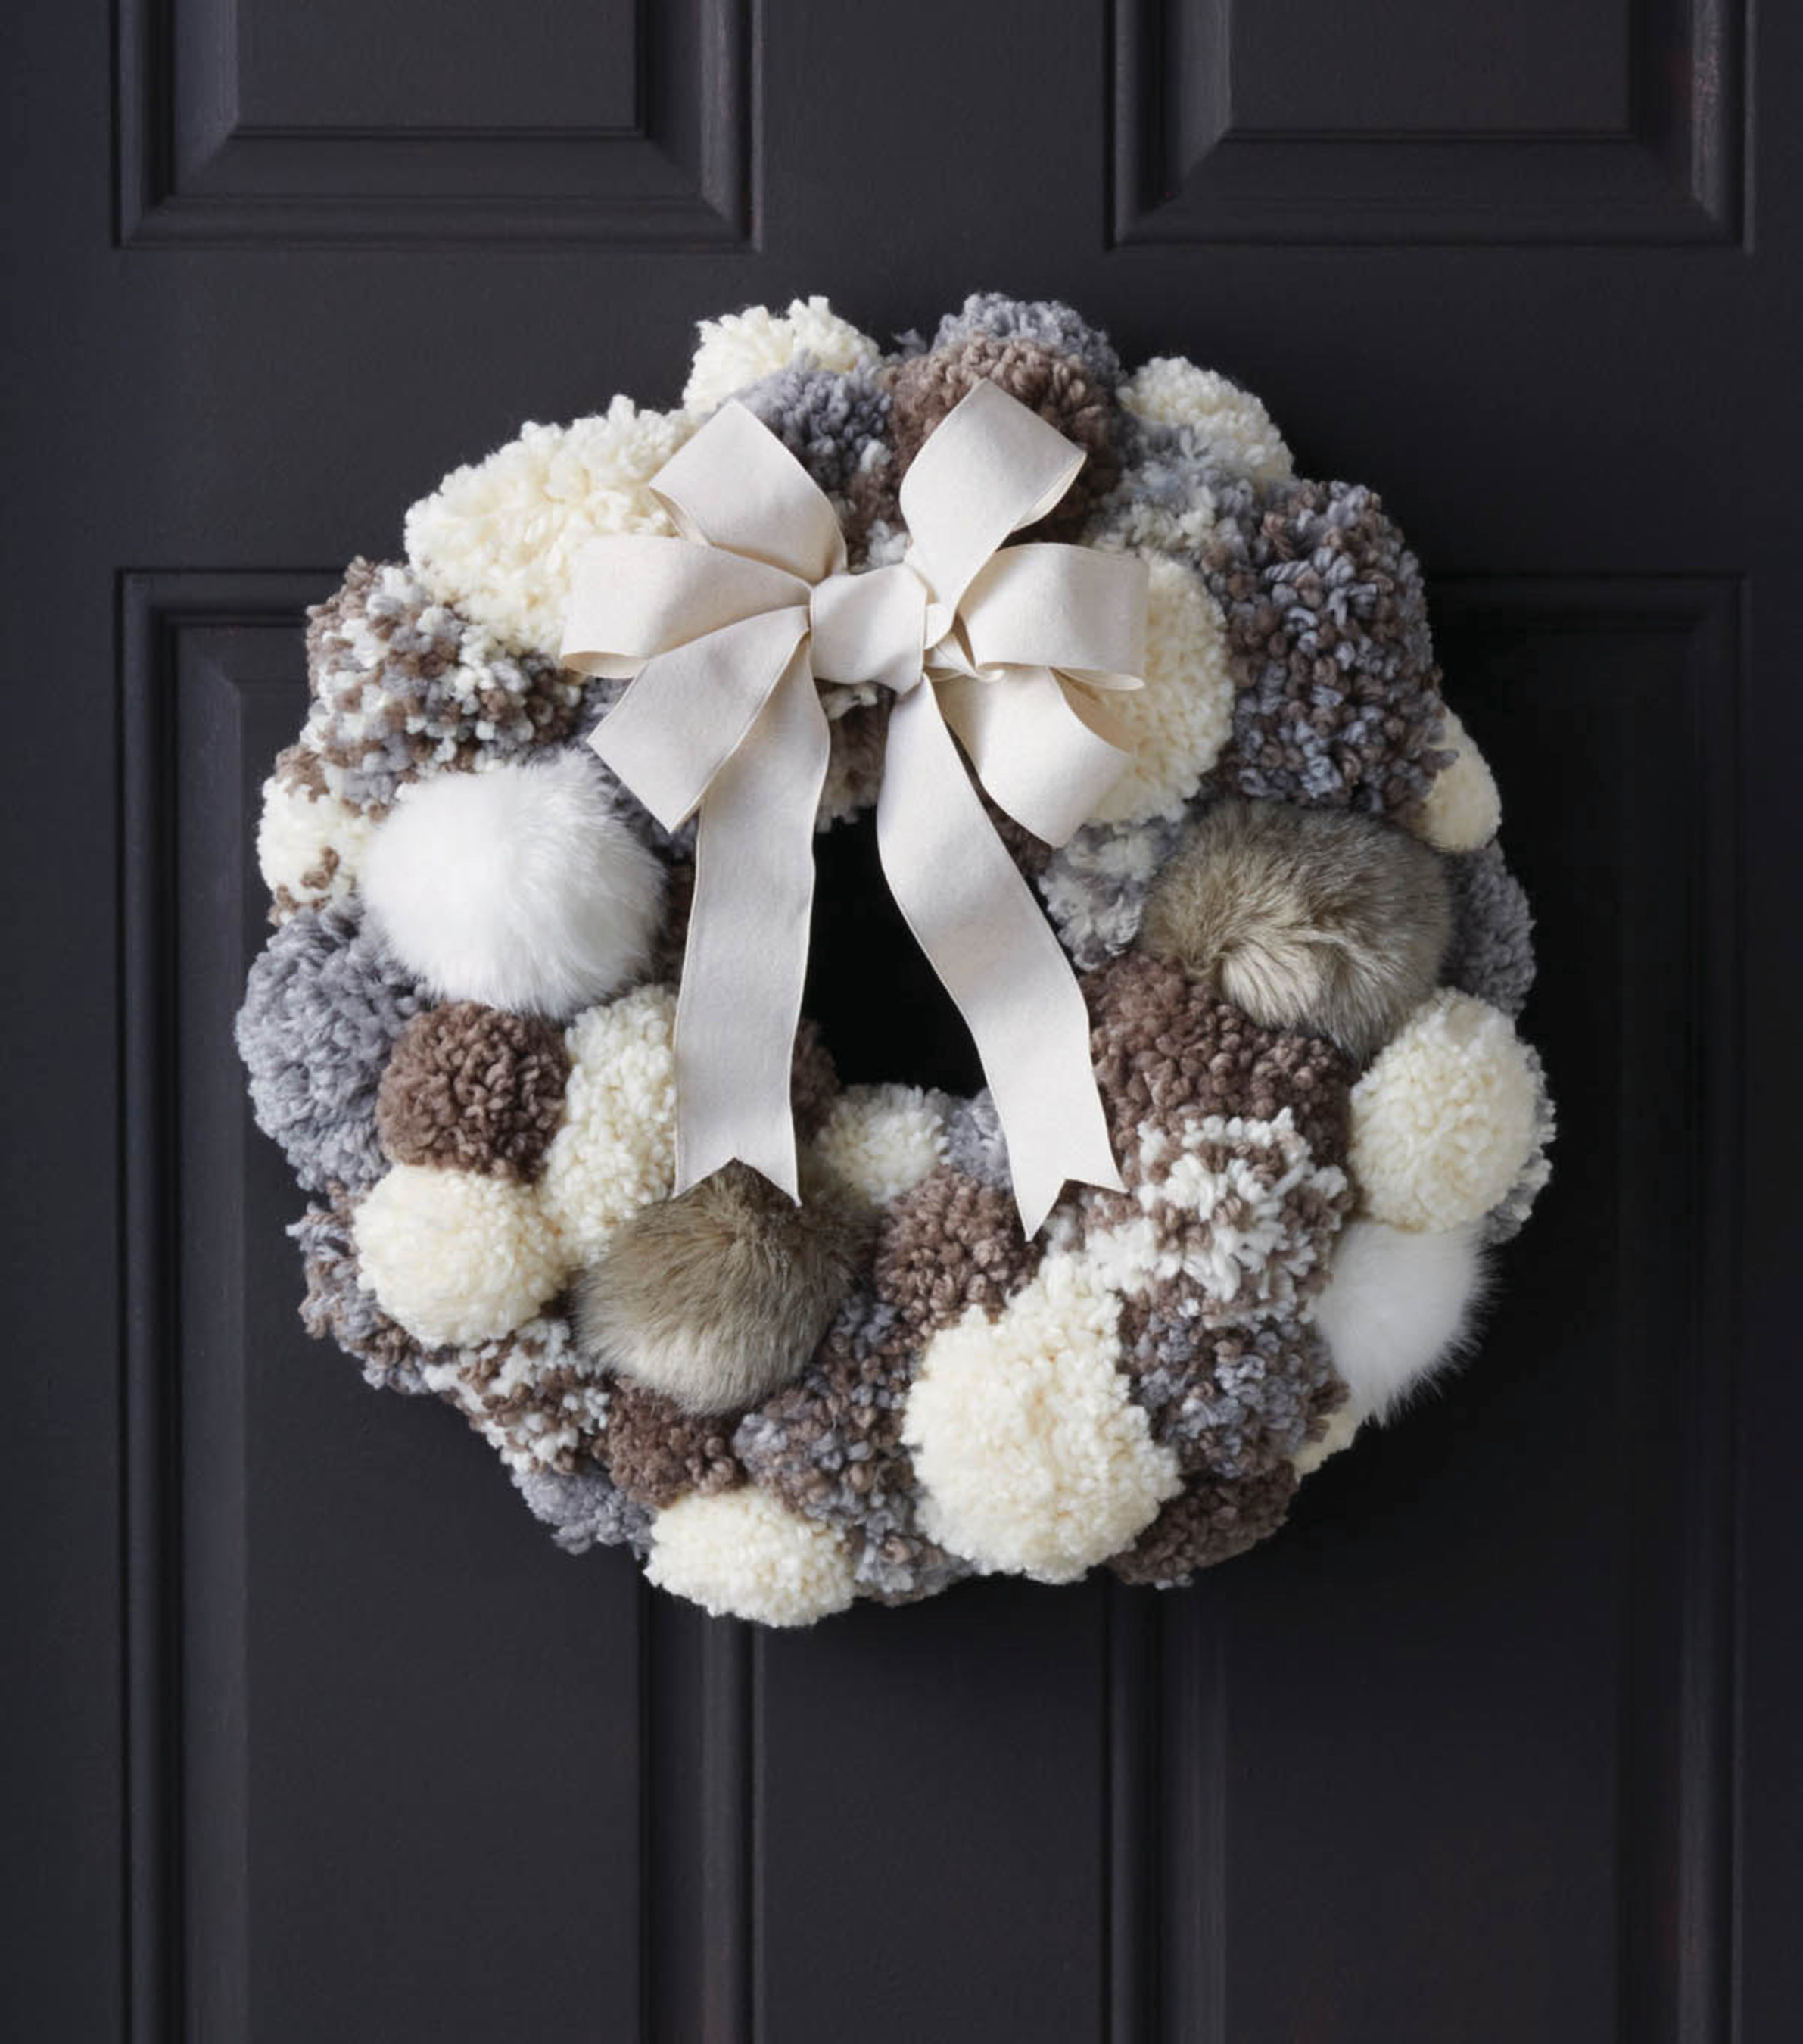 Handmade for the Holidays